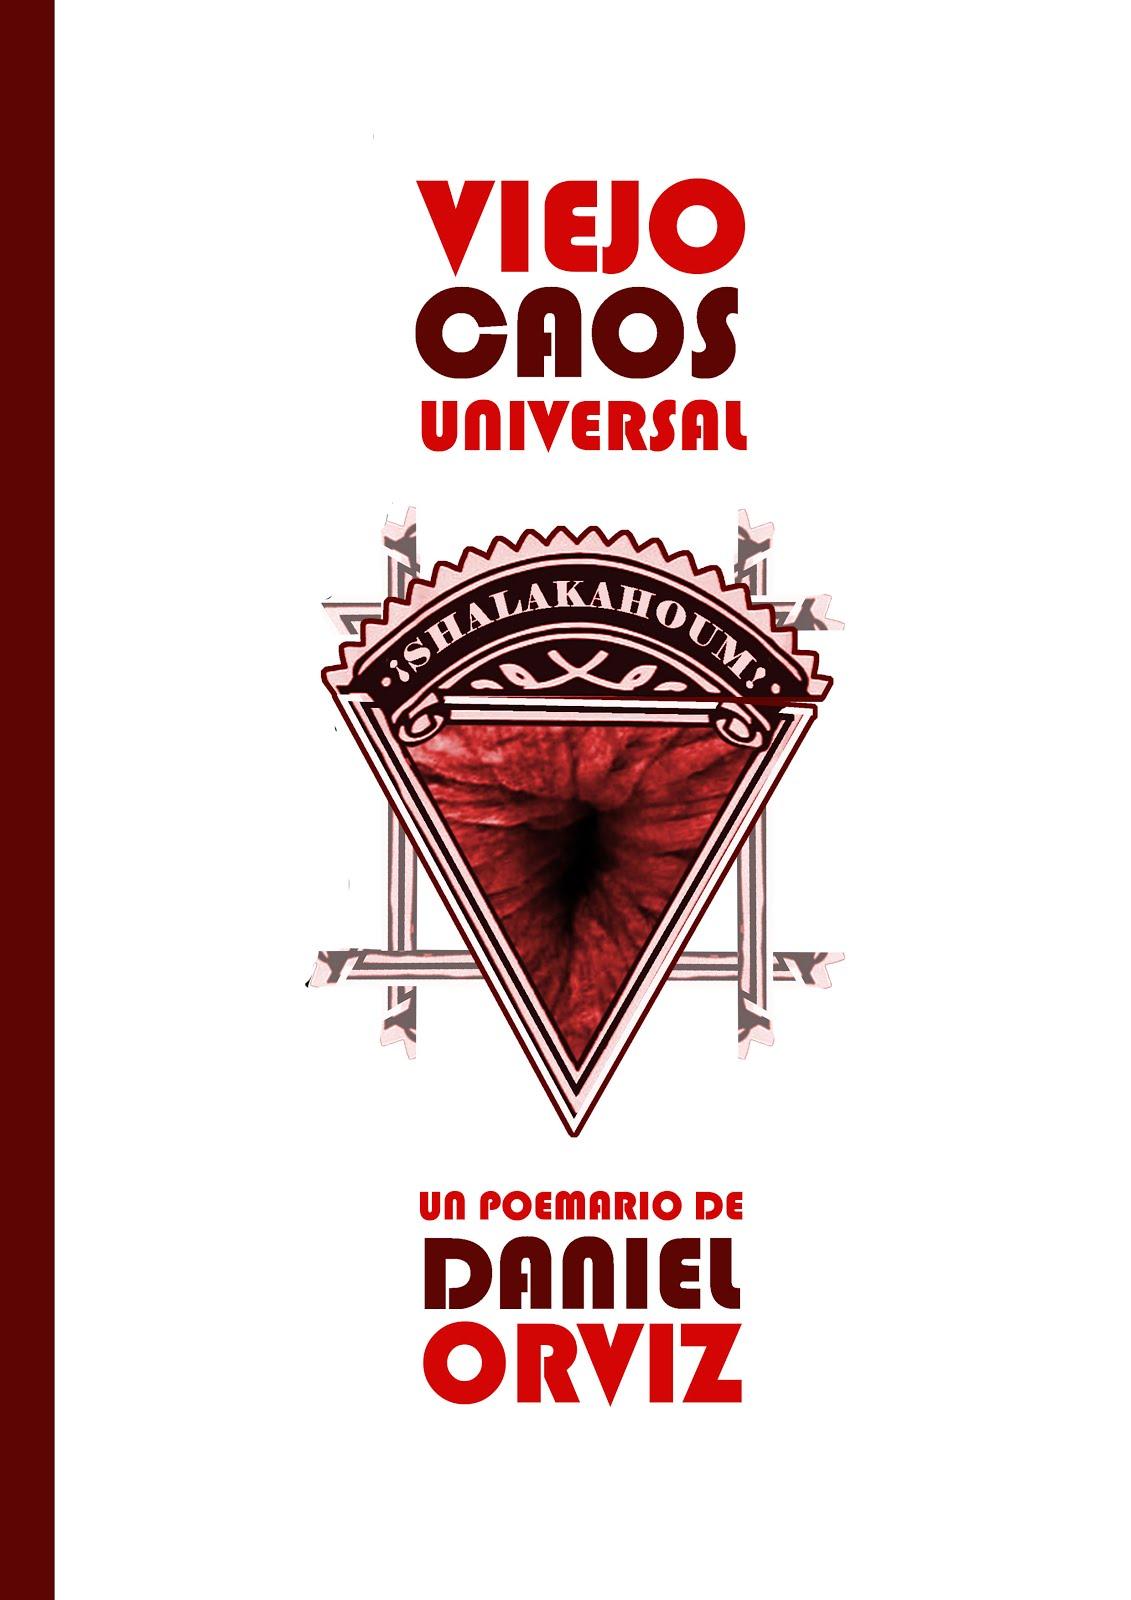 """VIEJO CAOS UNIVERSAL"" (2015)"